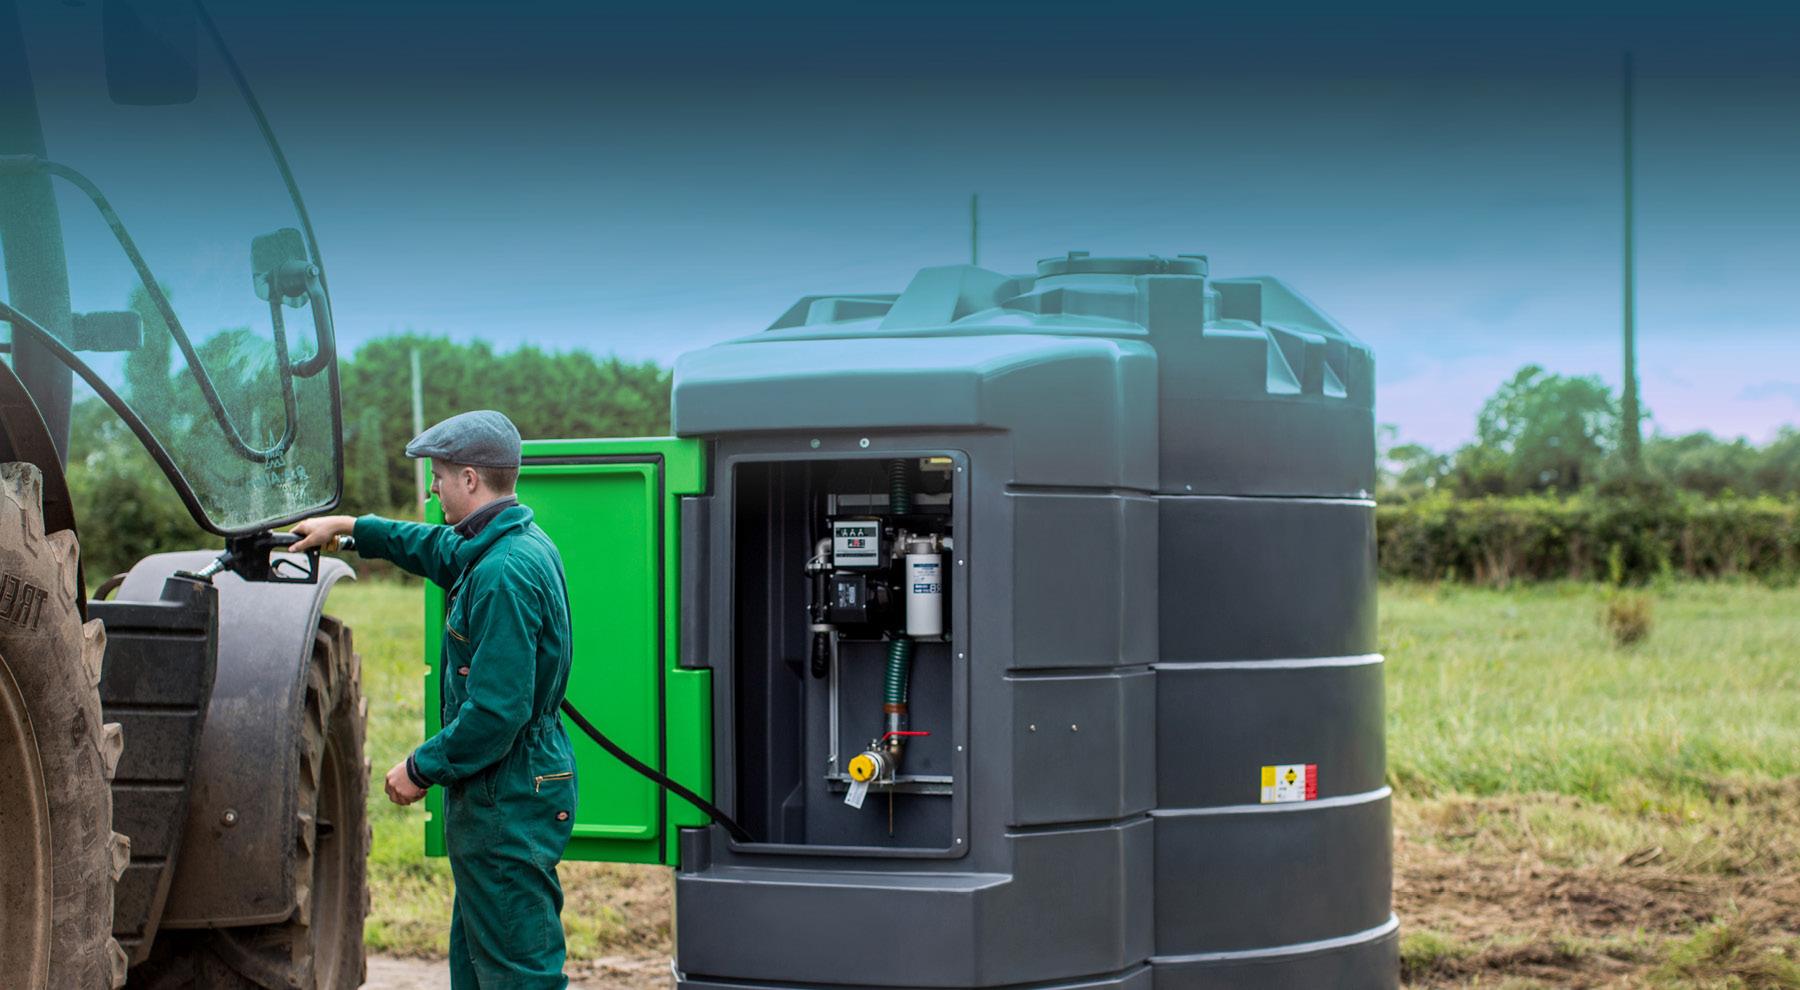 Depósitos de Diesel, AdBlue e Fertilizantes